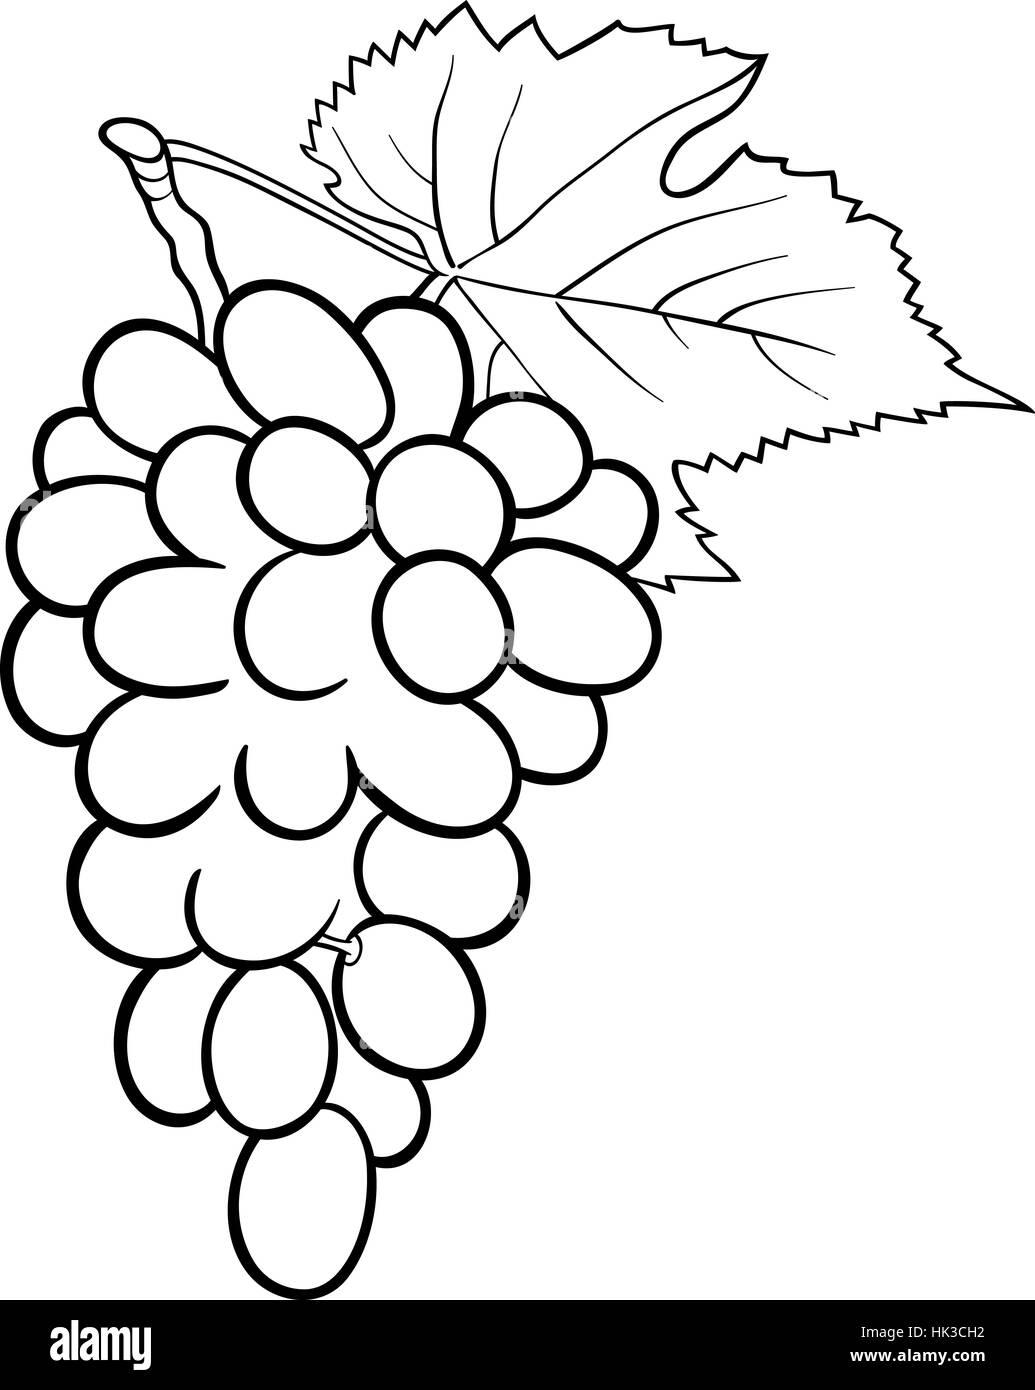 Grapes Fruit Illustration Fresh Black and White Stock Photos ...